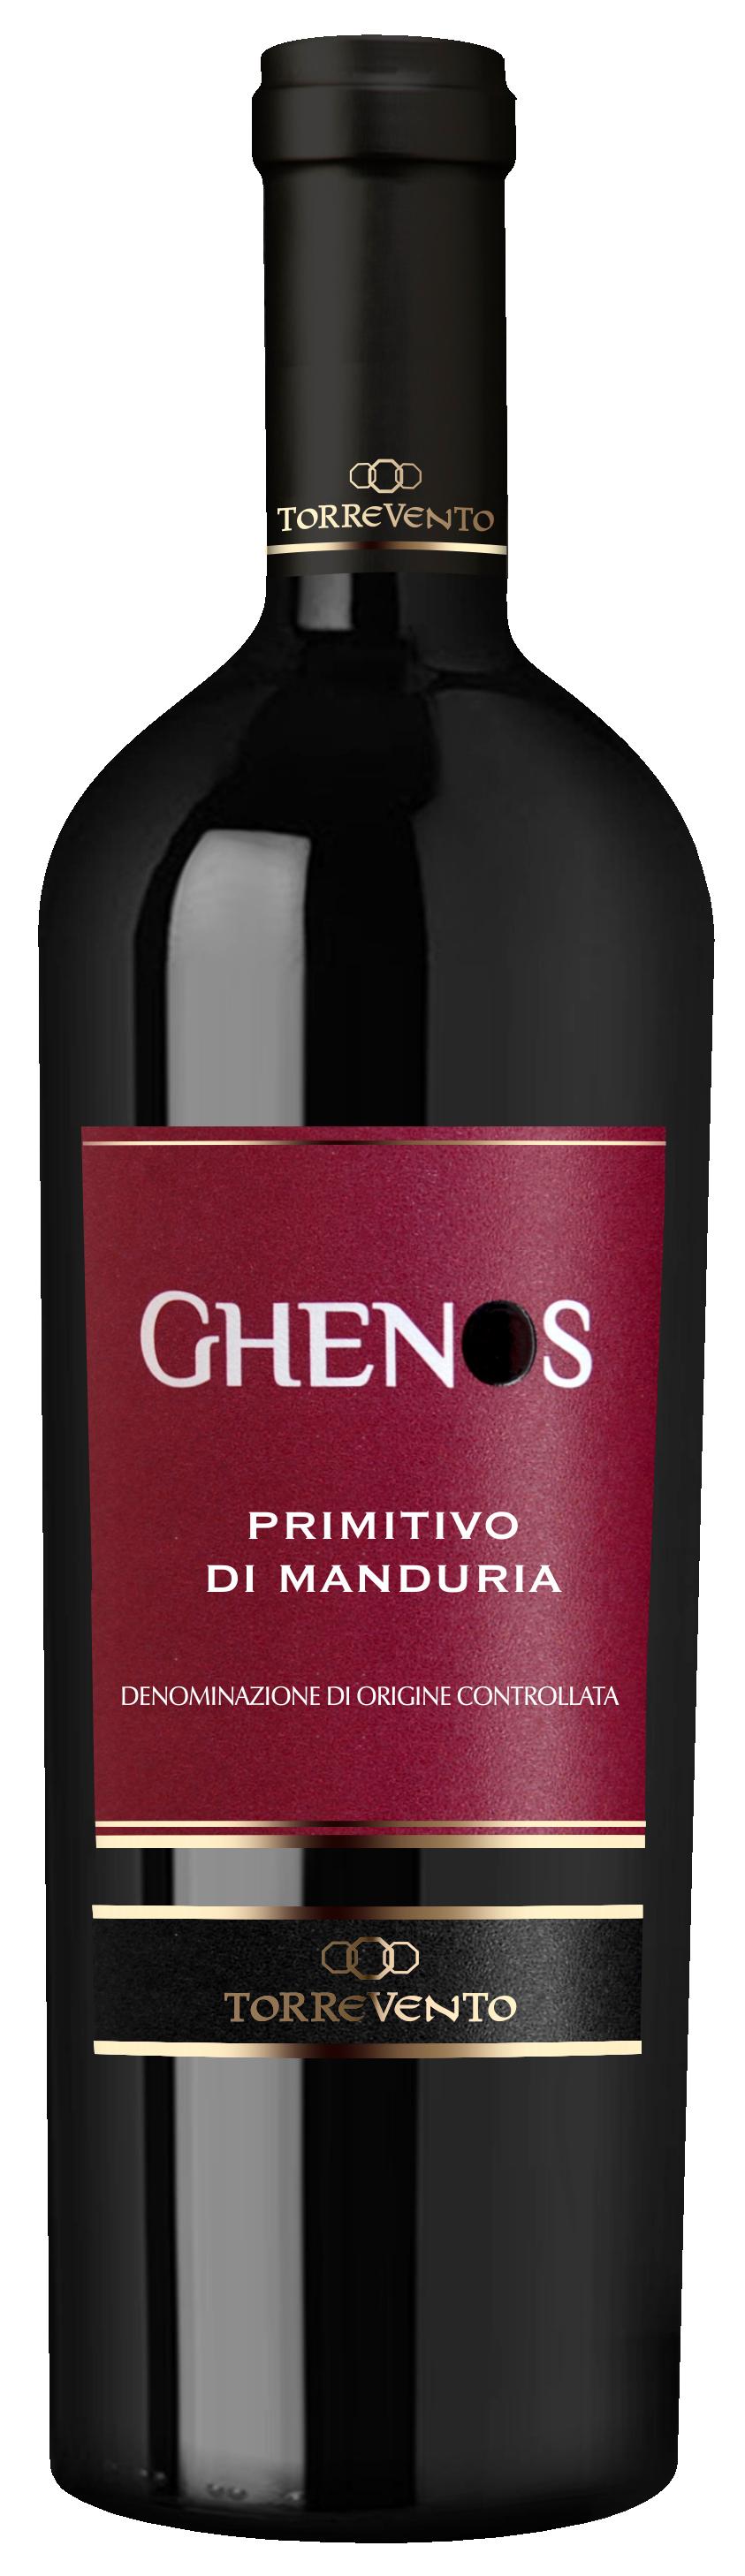 Ghenos-Primitivo-di-Manduria